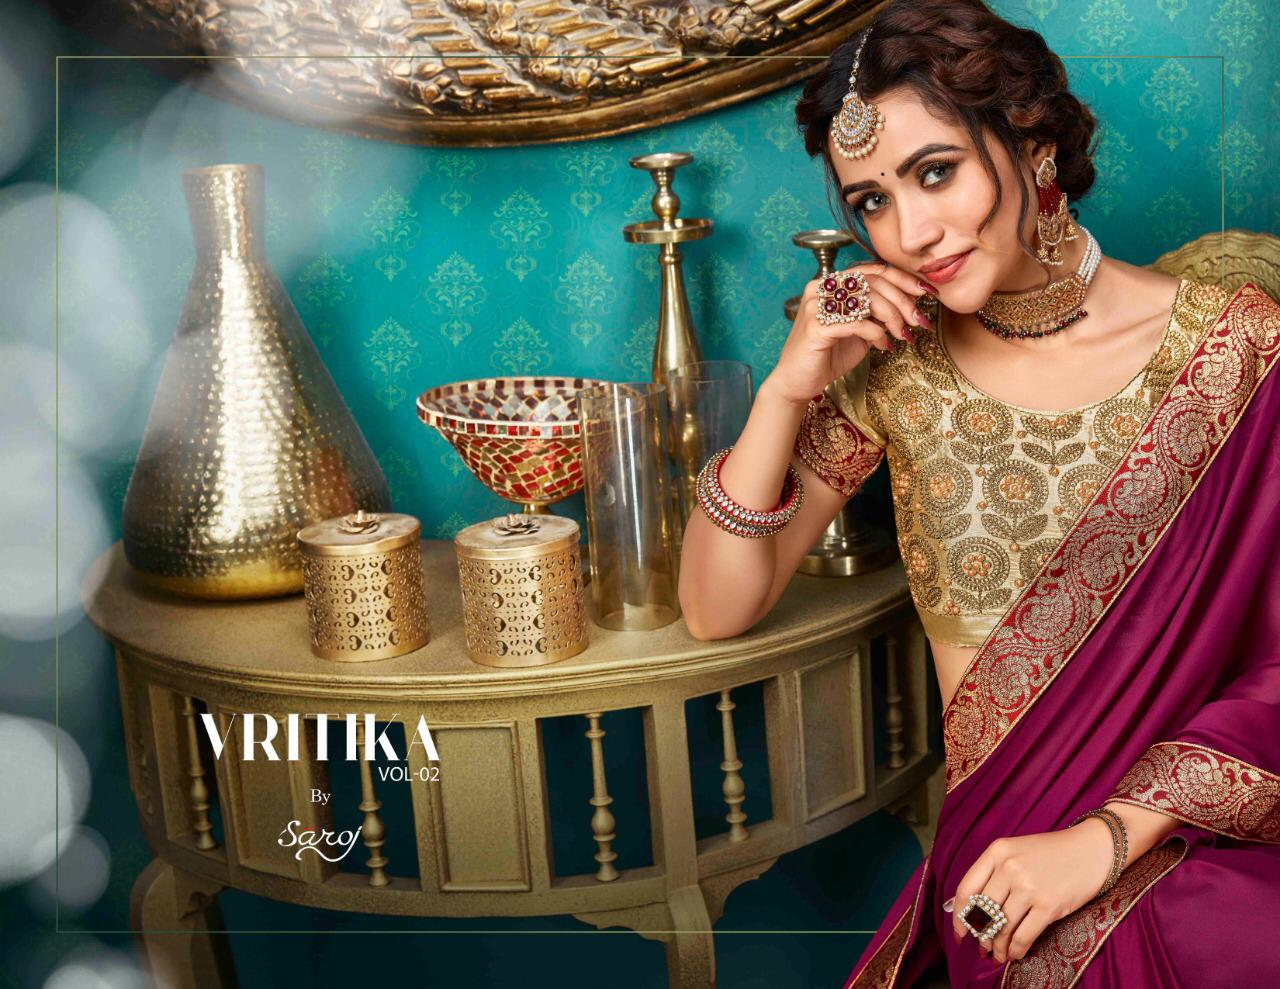 saroj vritika 2 colorful fancy collection of sarees